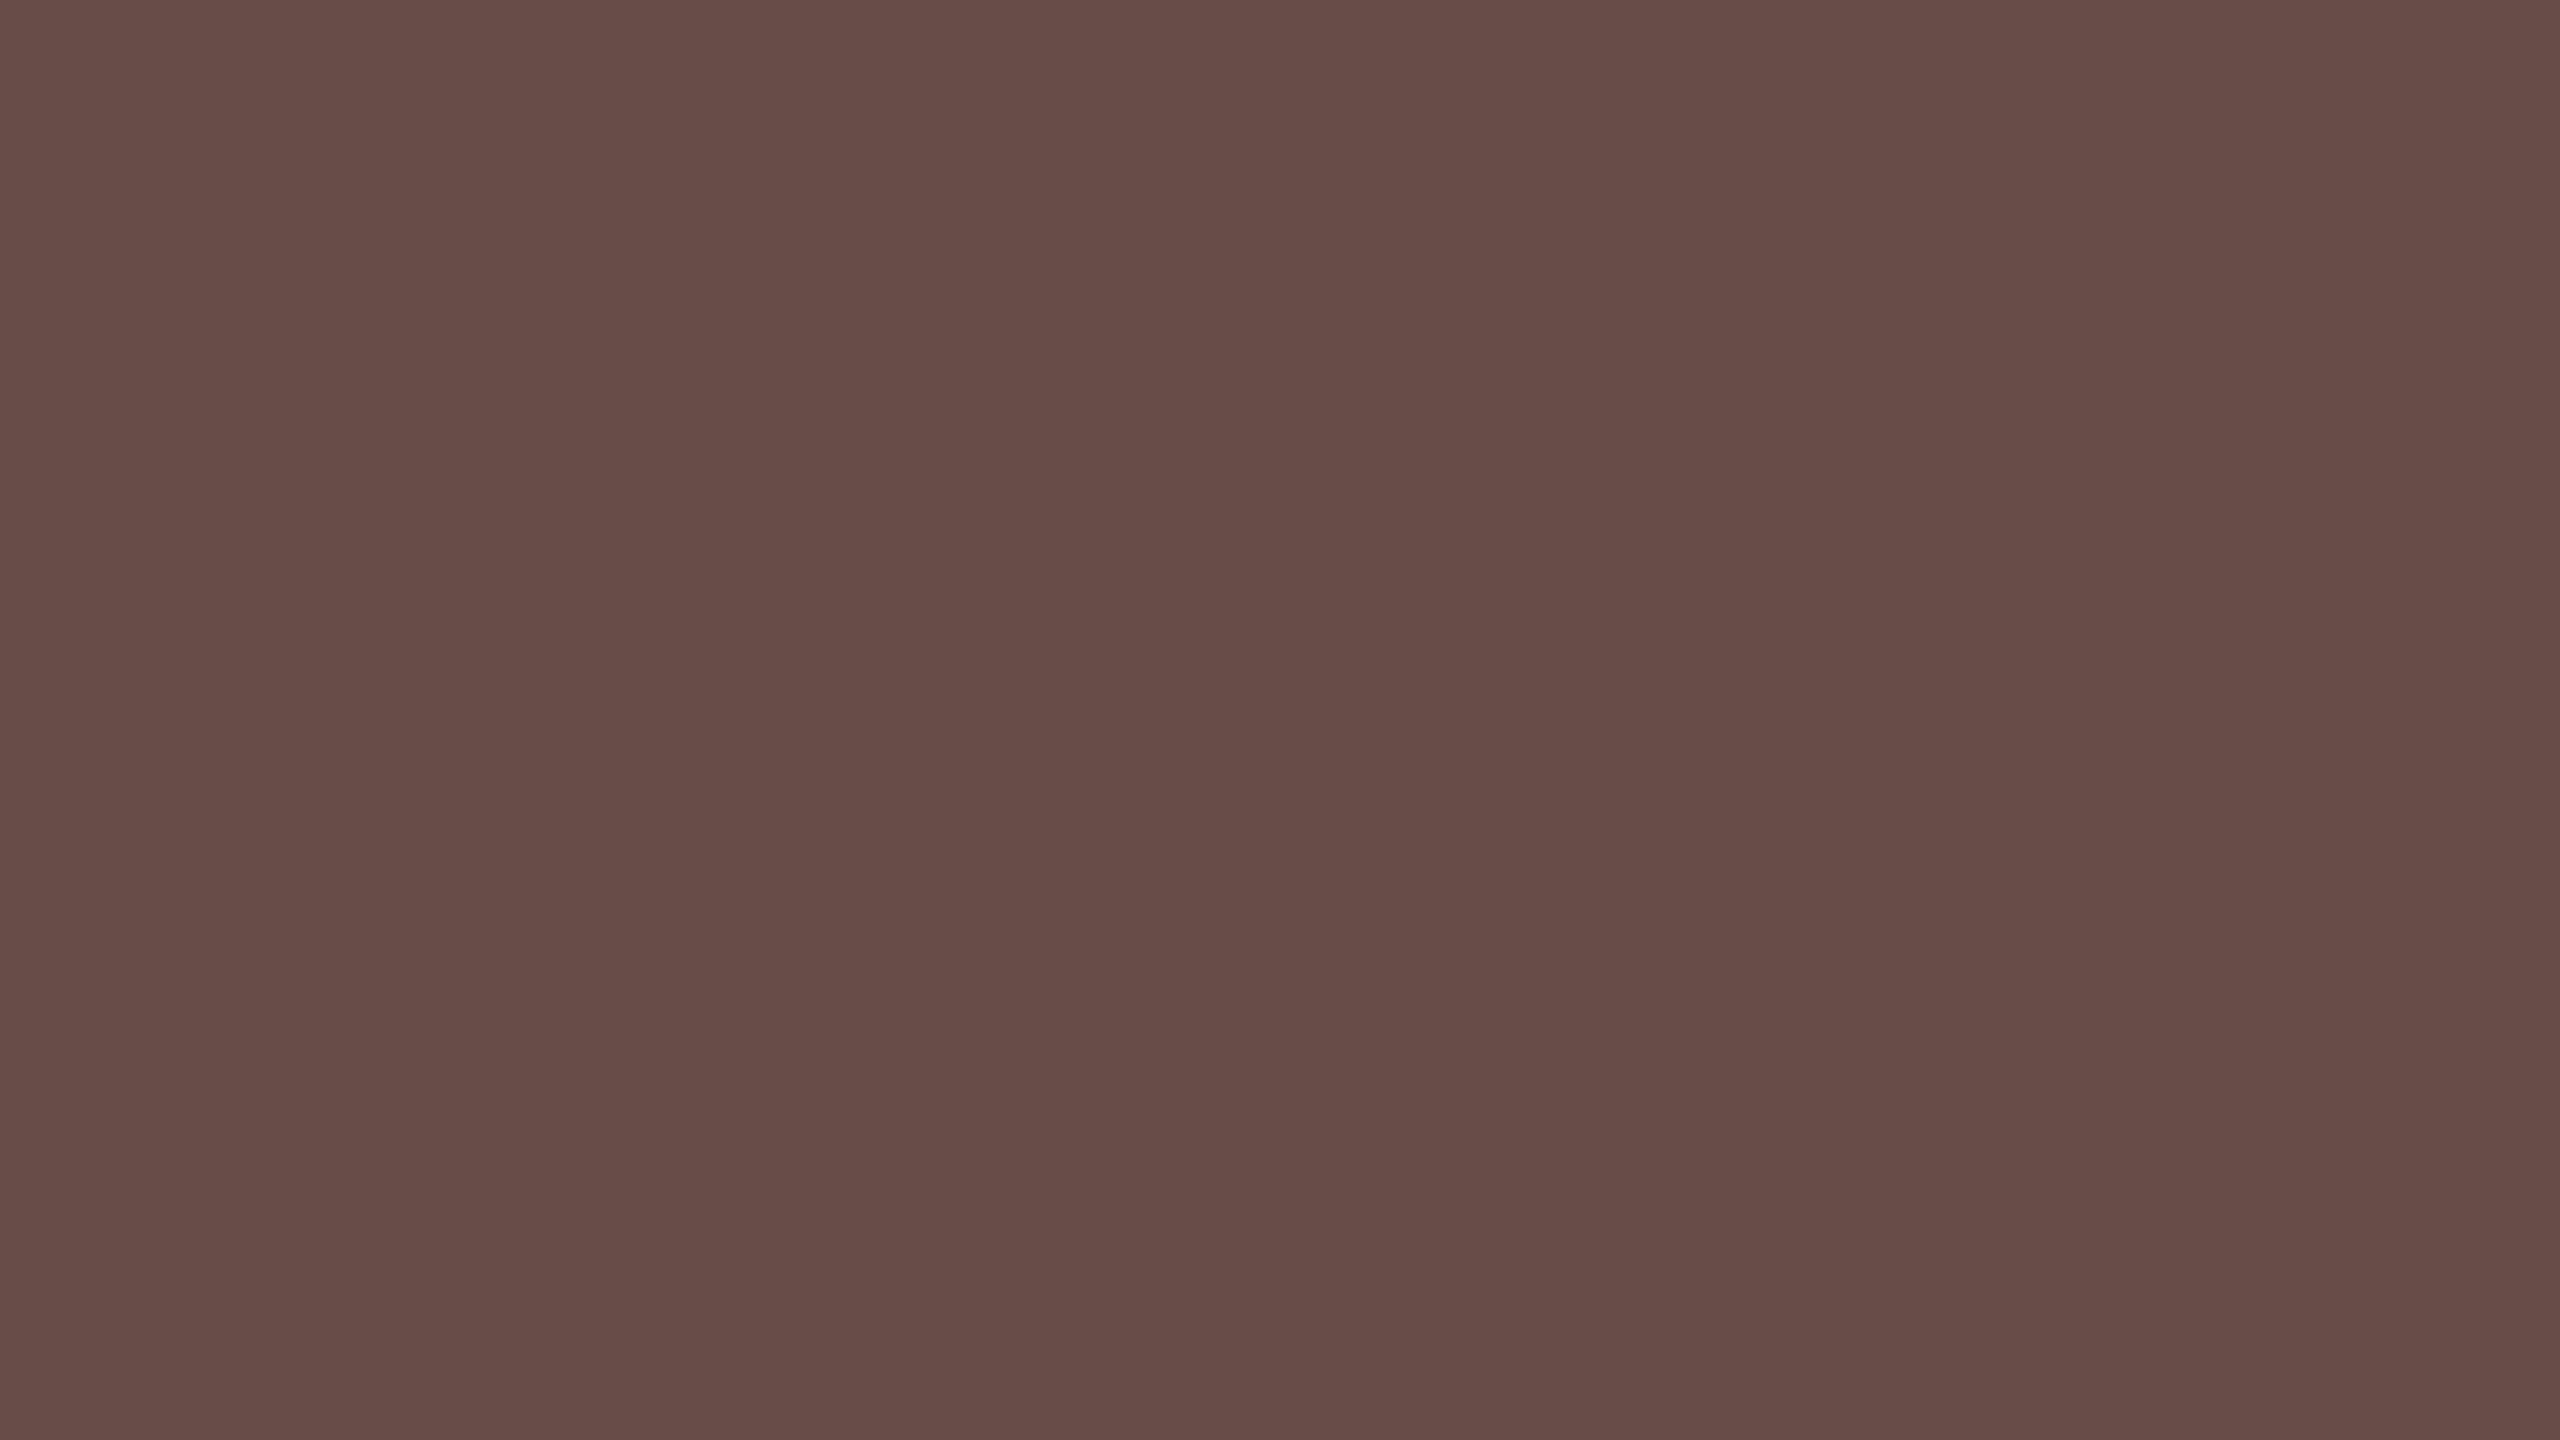 2560x1440 Liver Solid Color Background